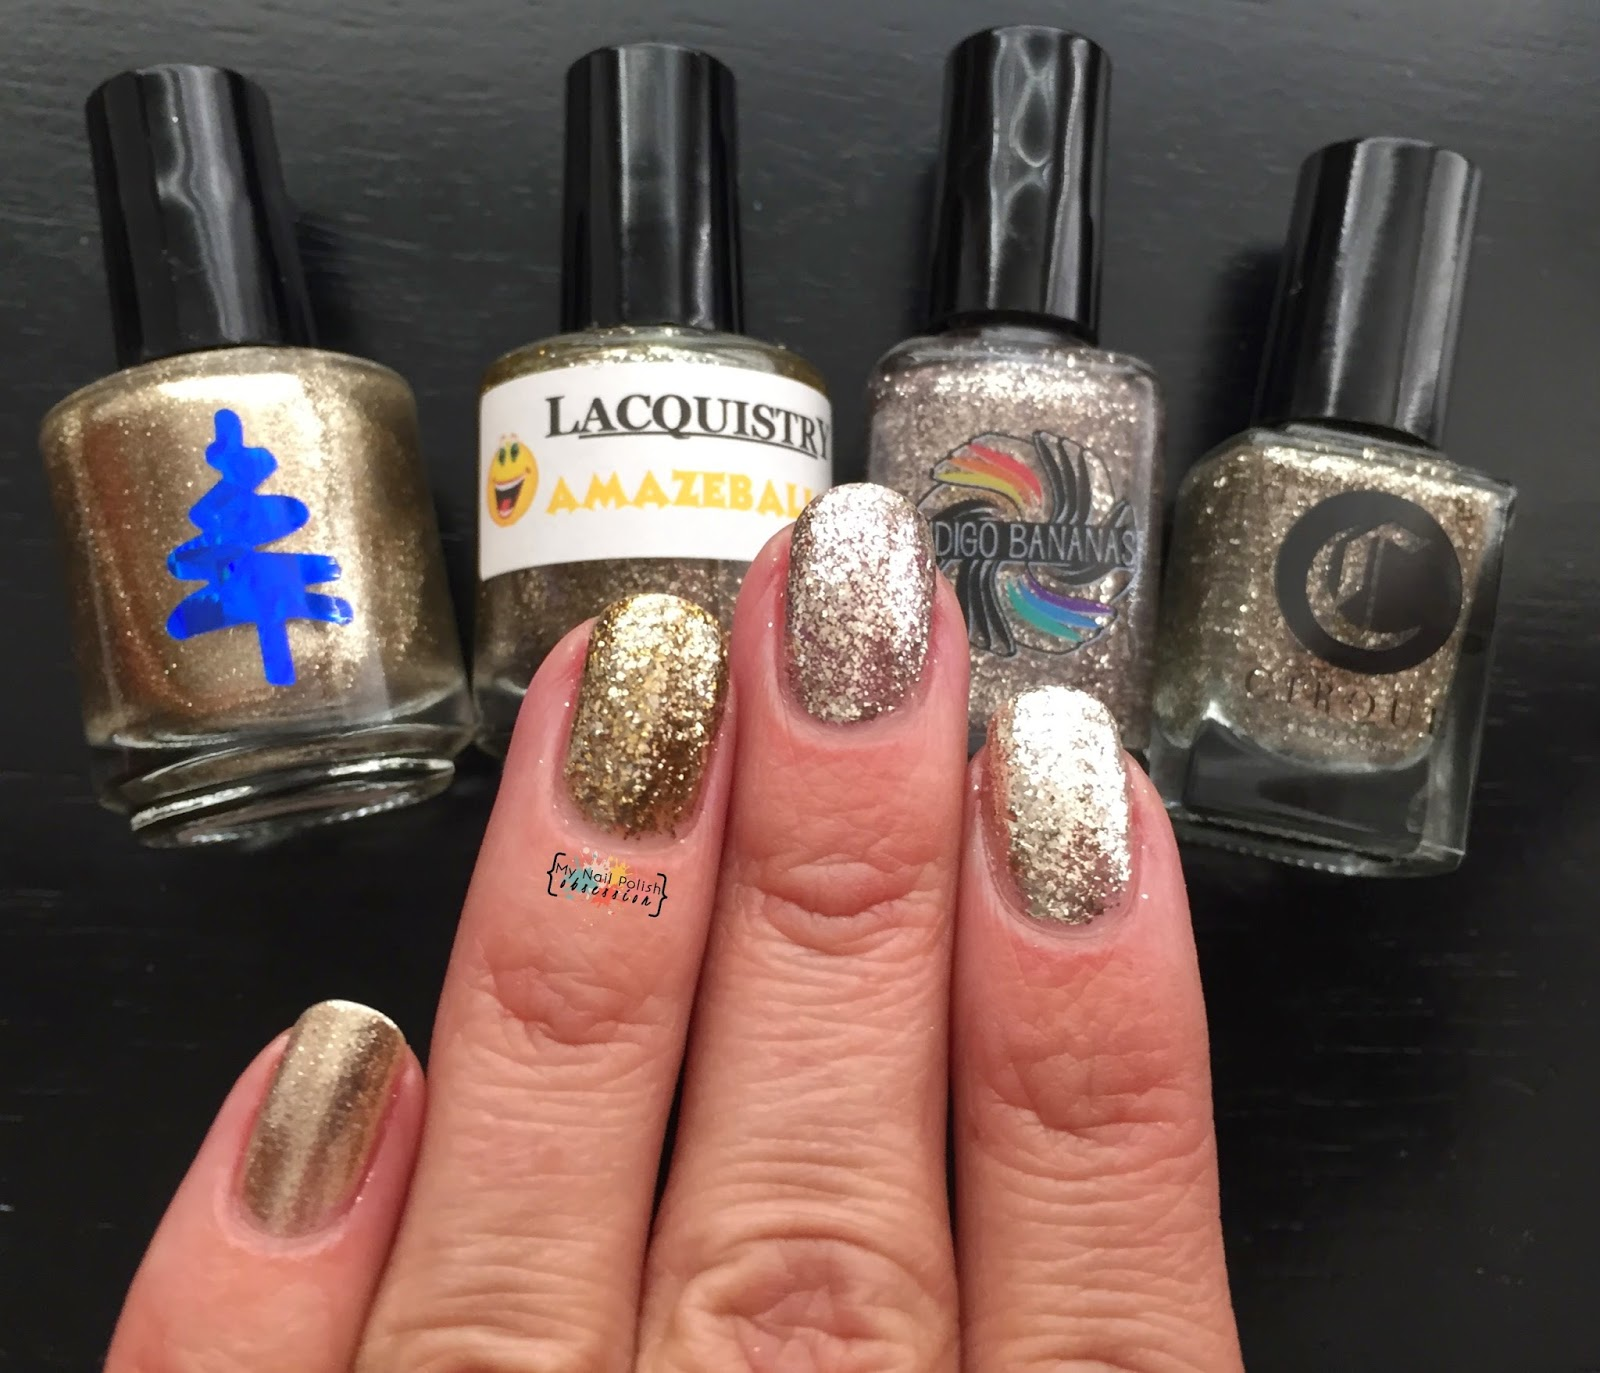 Battle of the Metallic Flakes: Cirque Colors Mirror Mirror, Indigo Bananas Moonlight, Lacquistry Amazeballz & Lumina Lacquer Tinseltown